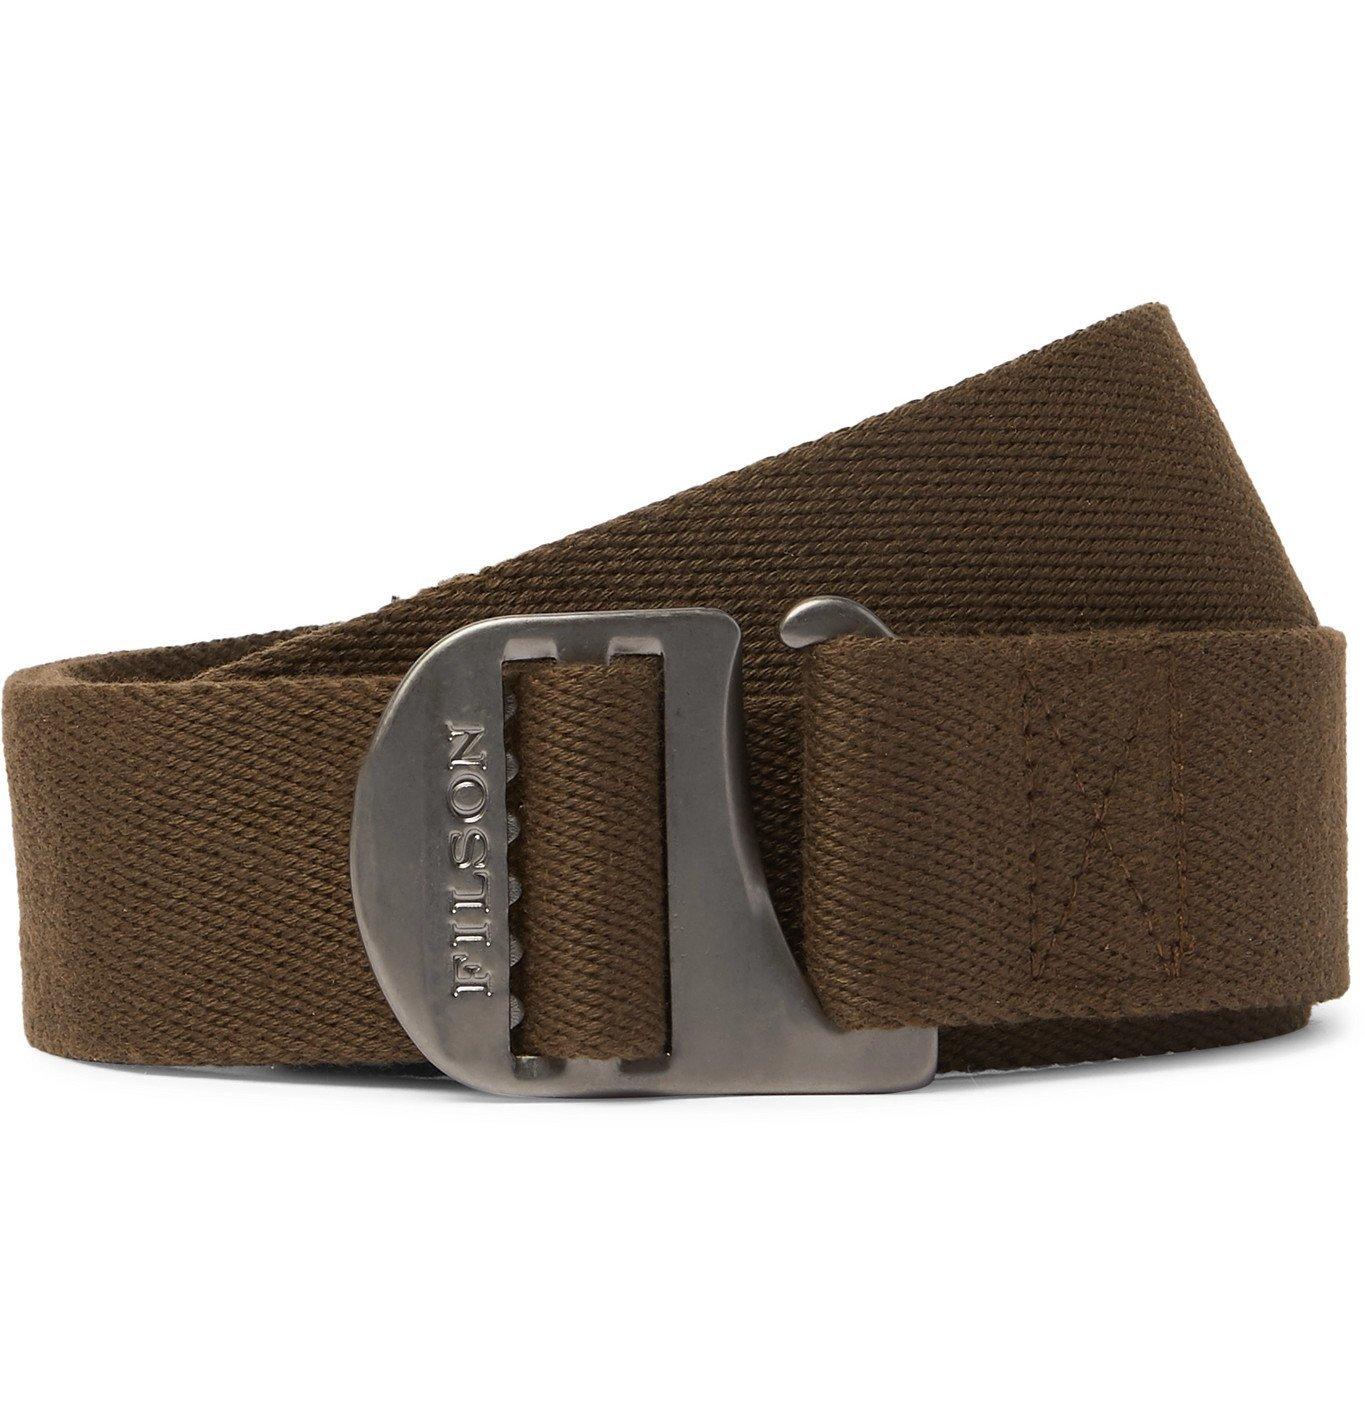 Filson - Togiak 4cm Leather-Trimmed Webbing Belt - Metallic